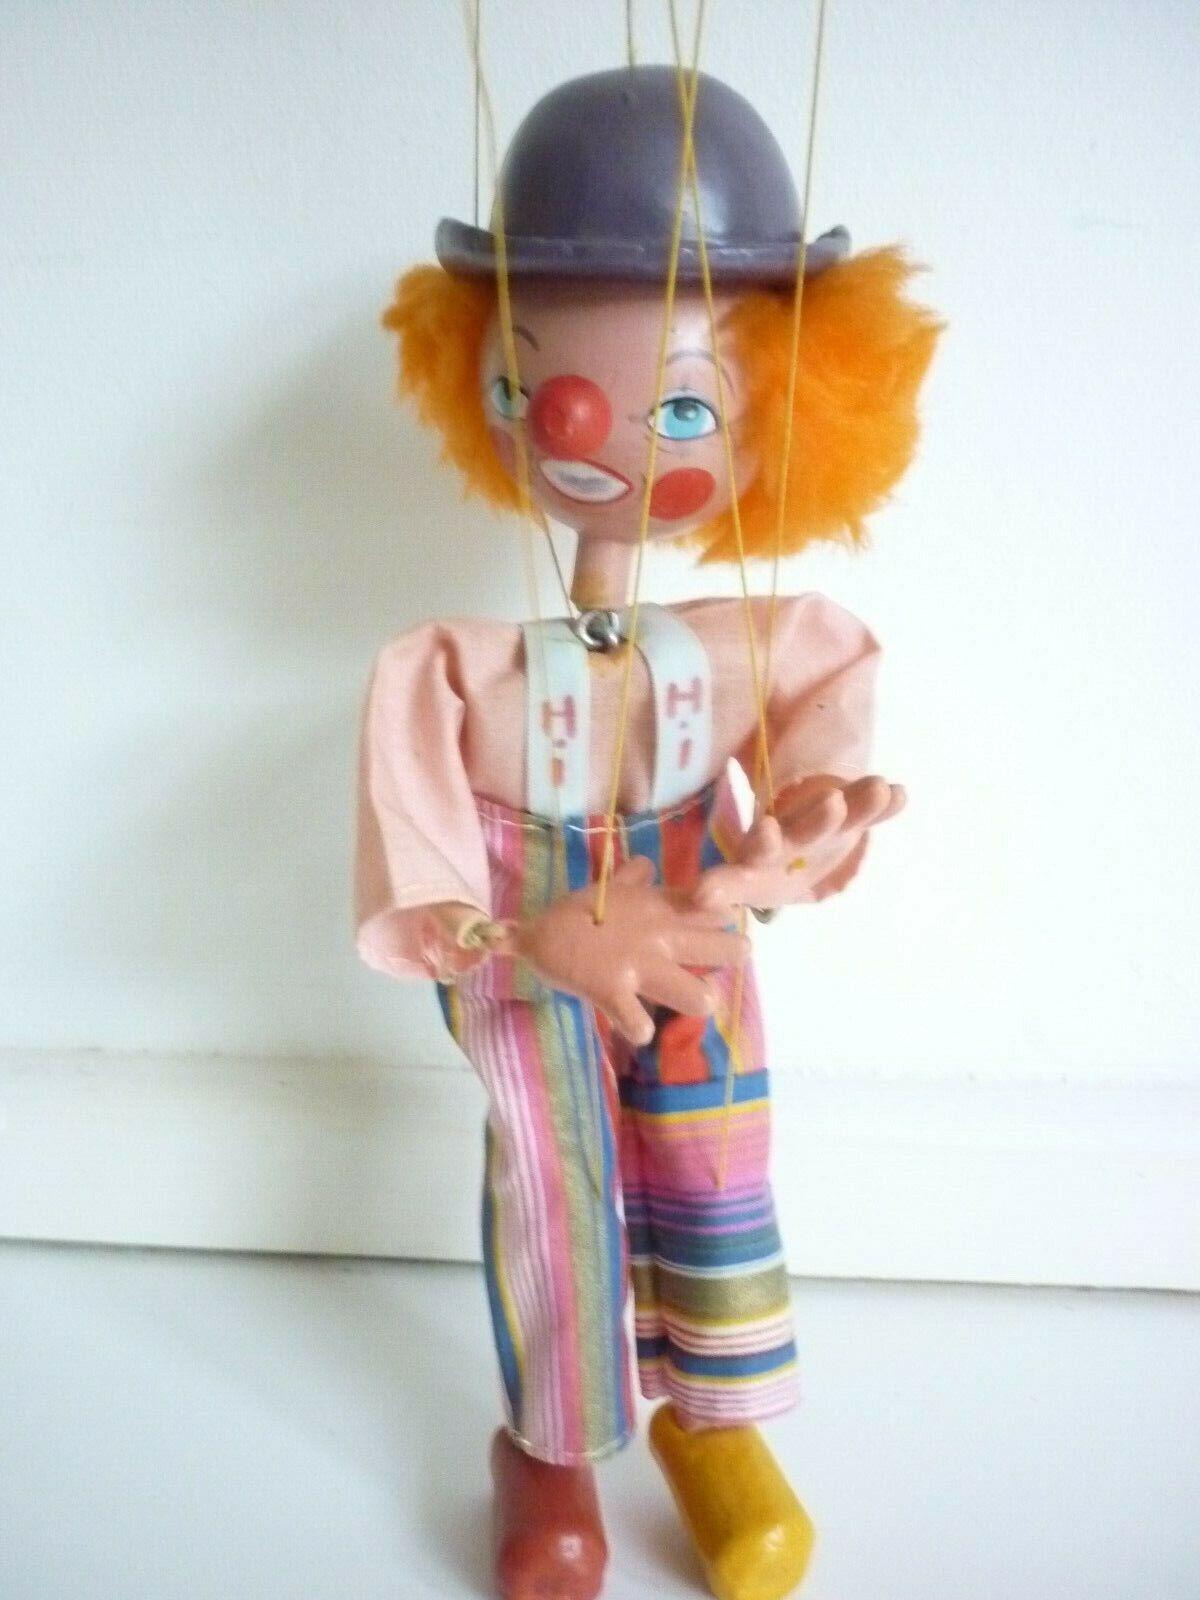 P T barnam Raro Pelham marioneta 1981 Musical Juguete de paladio al mejor Showman